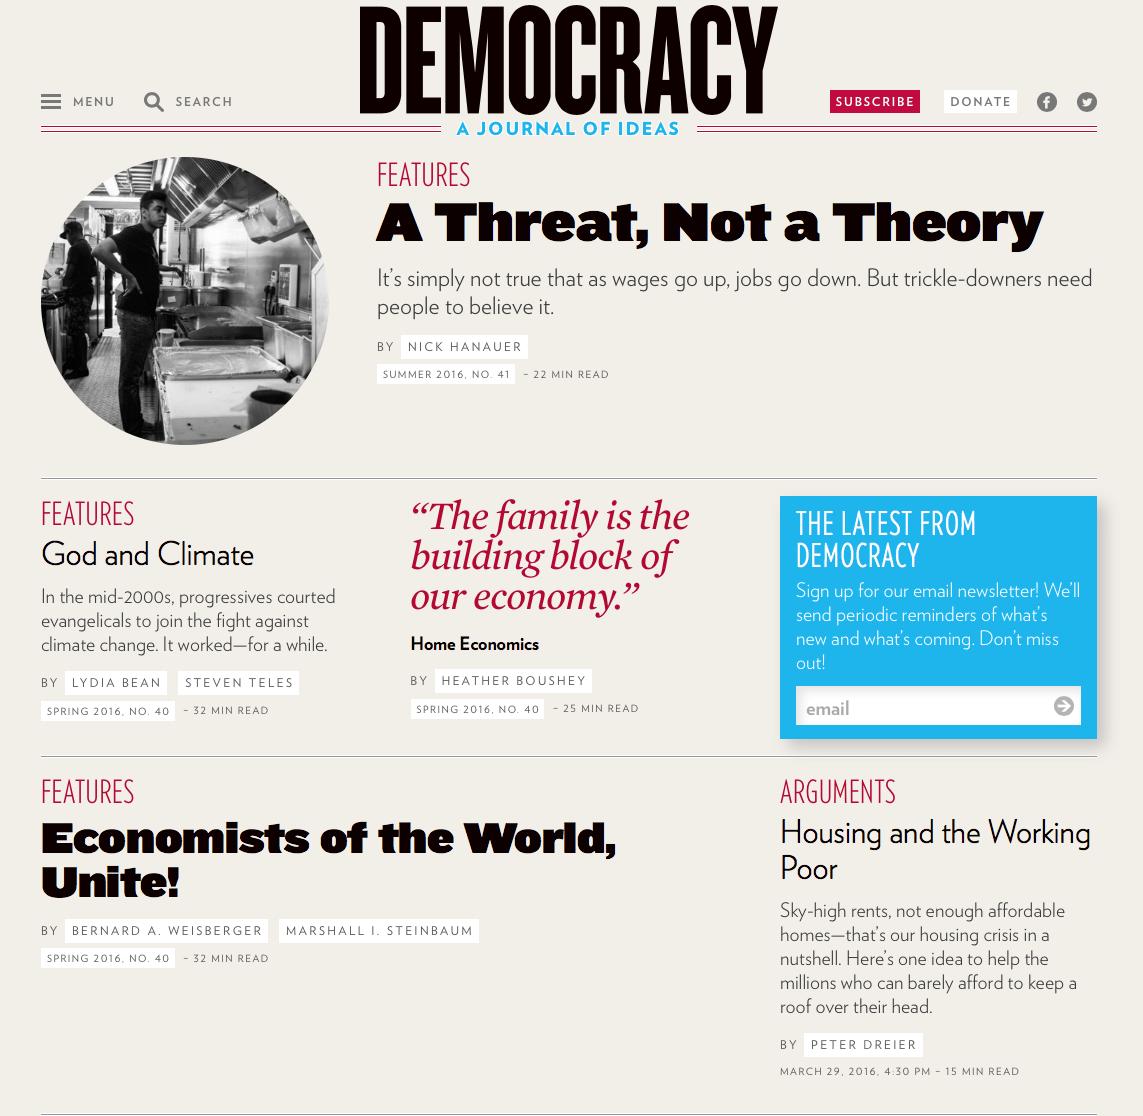 DEMOCRACY JOURNAL_ASNP_Website